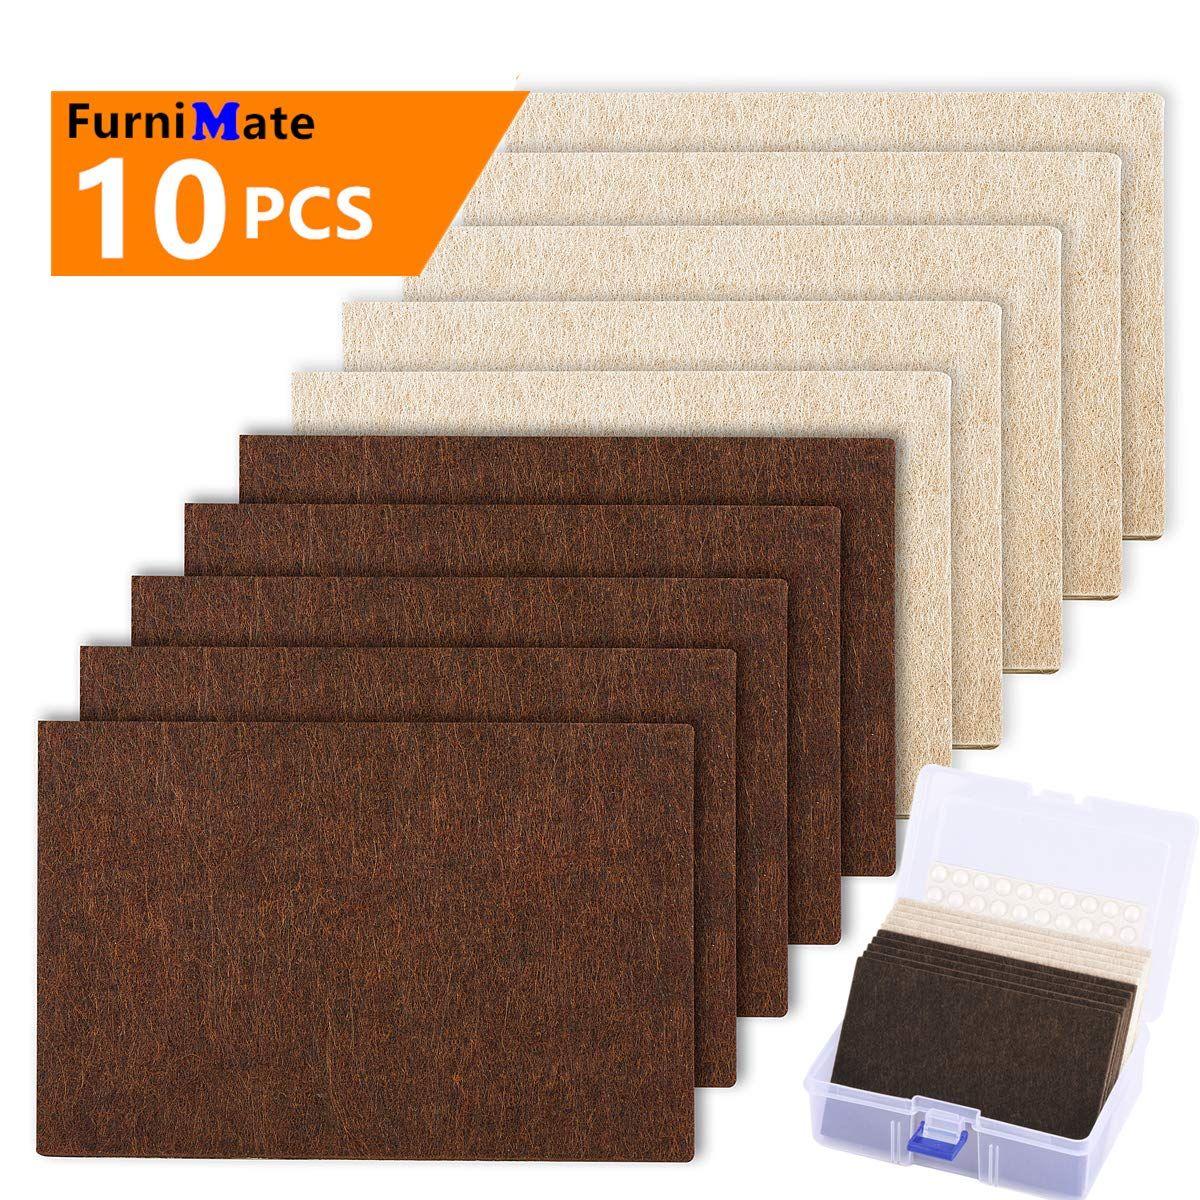 Keeping Furniture From Sliding On Hardwood Floors Hardwood Floors Flooring Furniture Floor Protectors